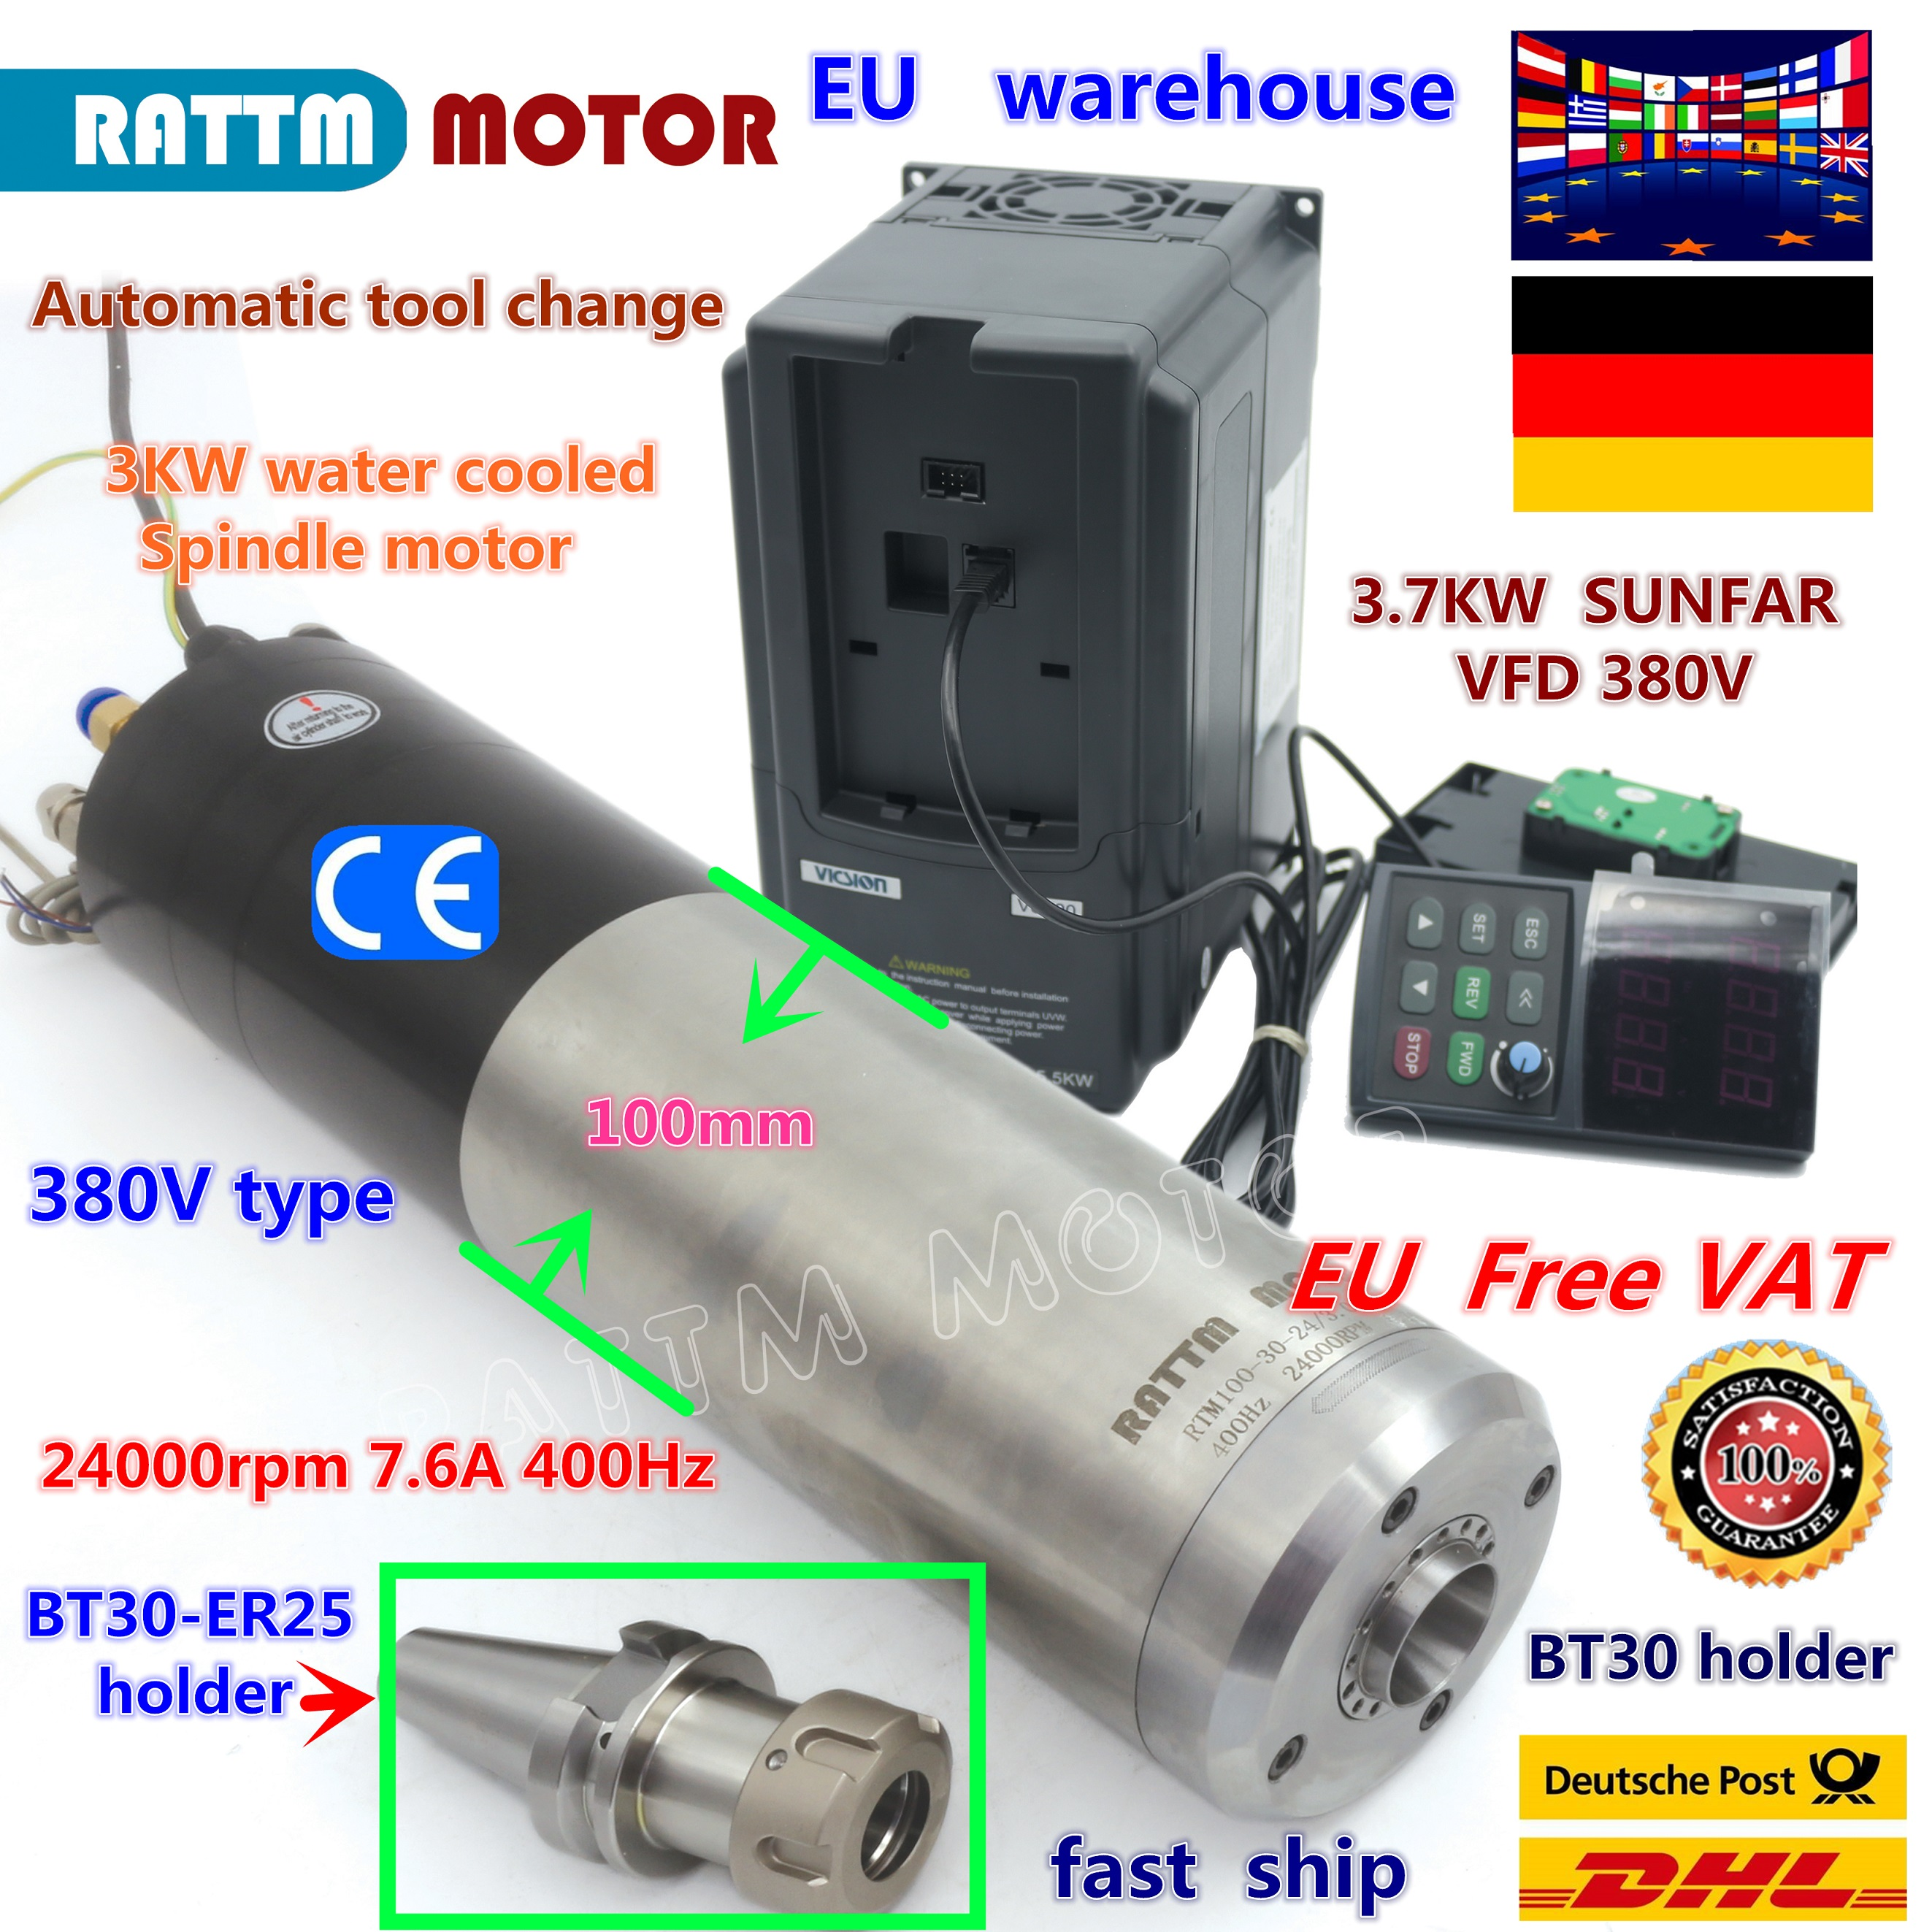 【Free VAT】 3KW ATC Water Cooled Automatic Tool Change Spindle Motor BT30 & 3.7KW VFD Inverter 220V / 380V FOR CNC Router MILLING